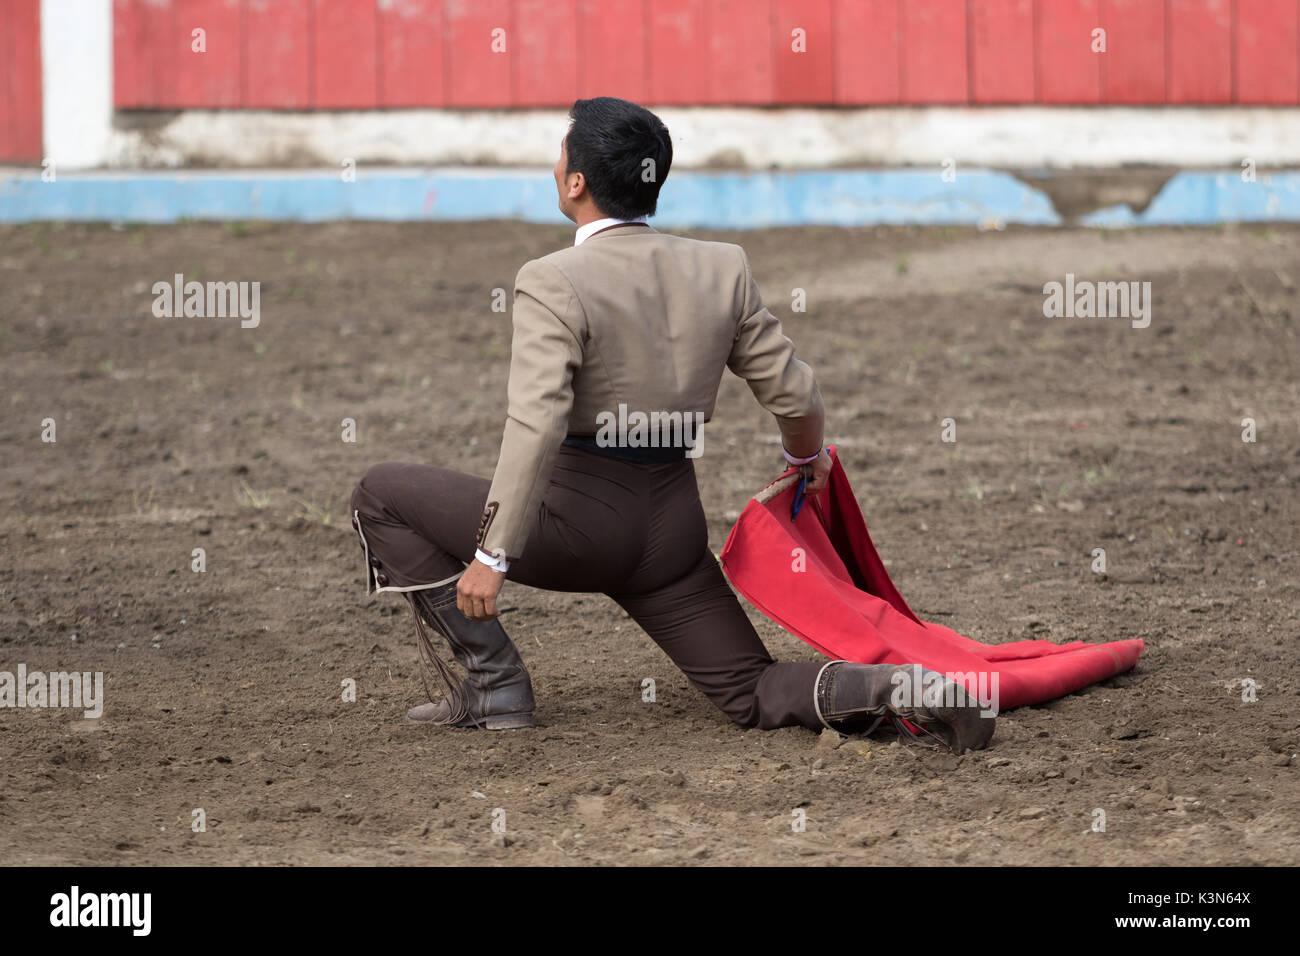 bullfighter kneeling in the arena - Stock Image